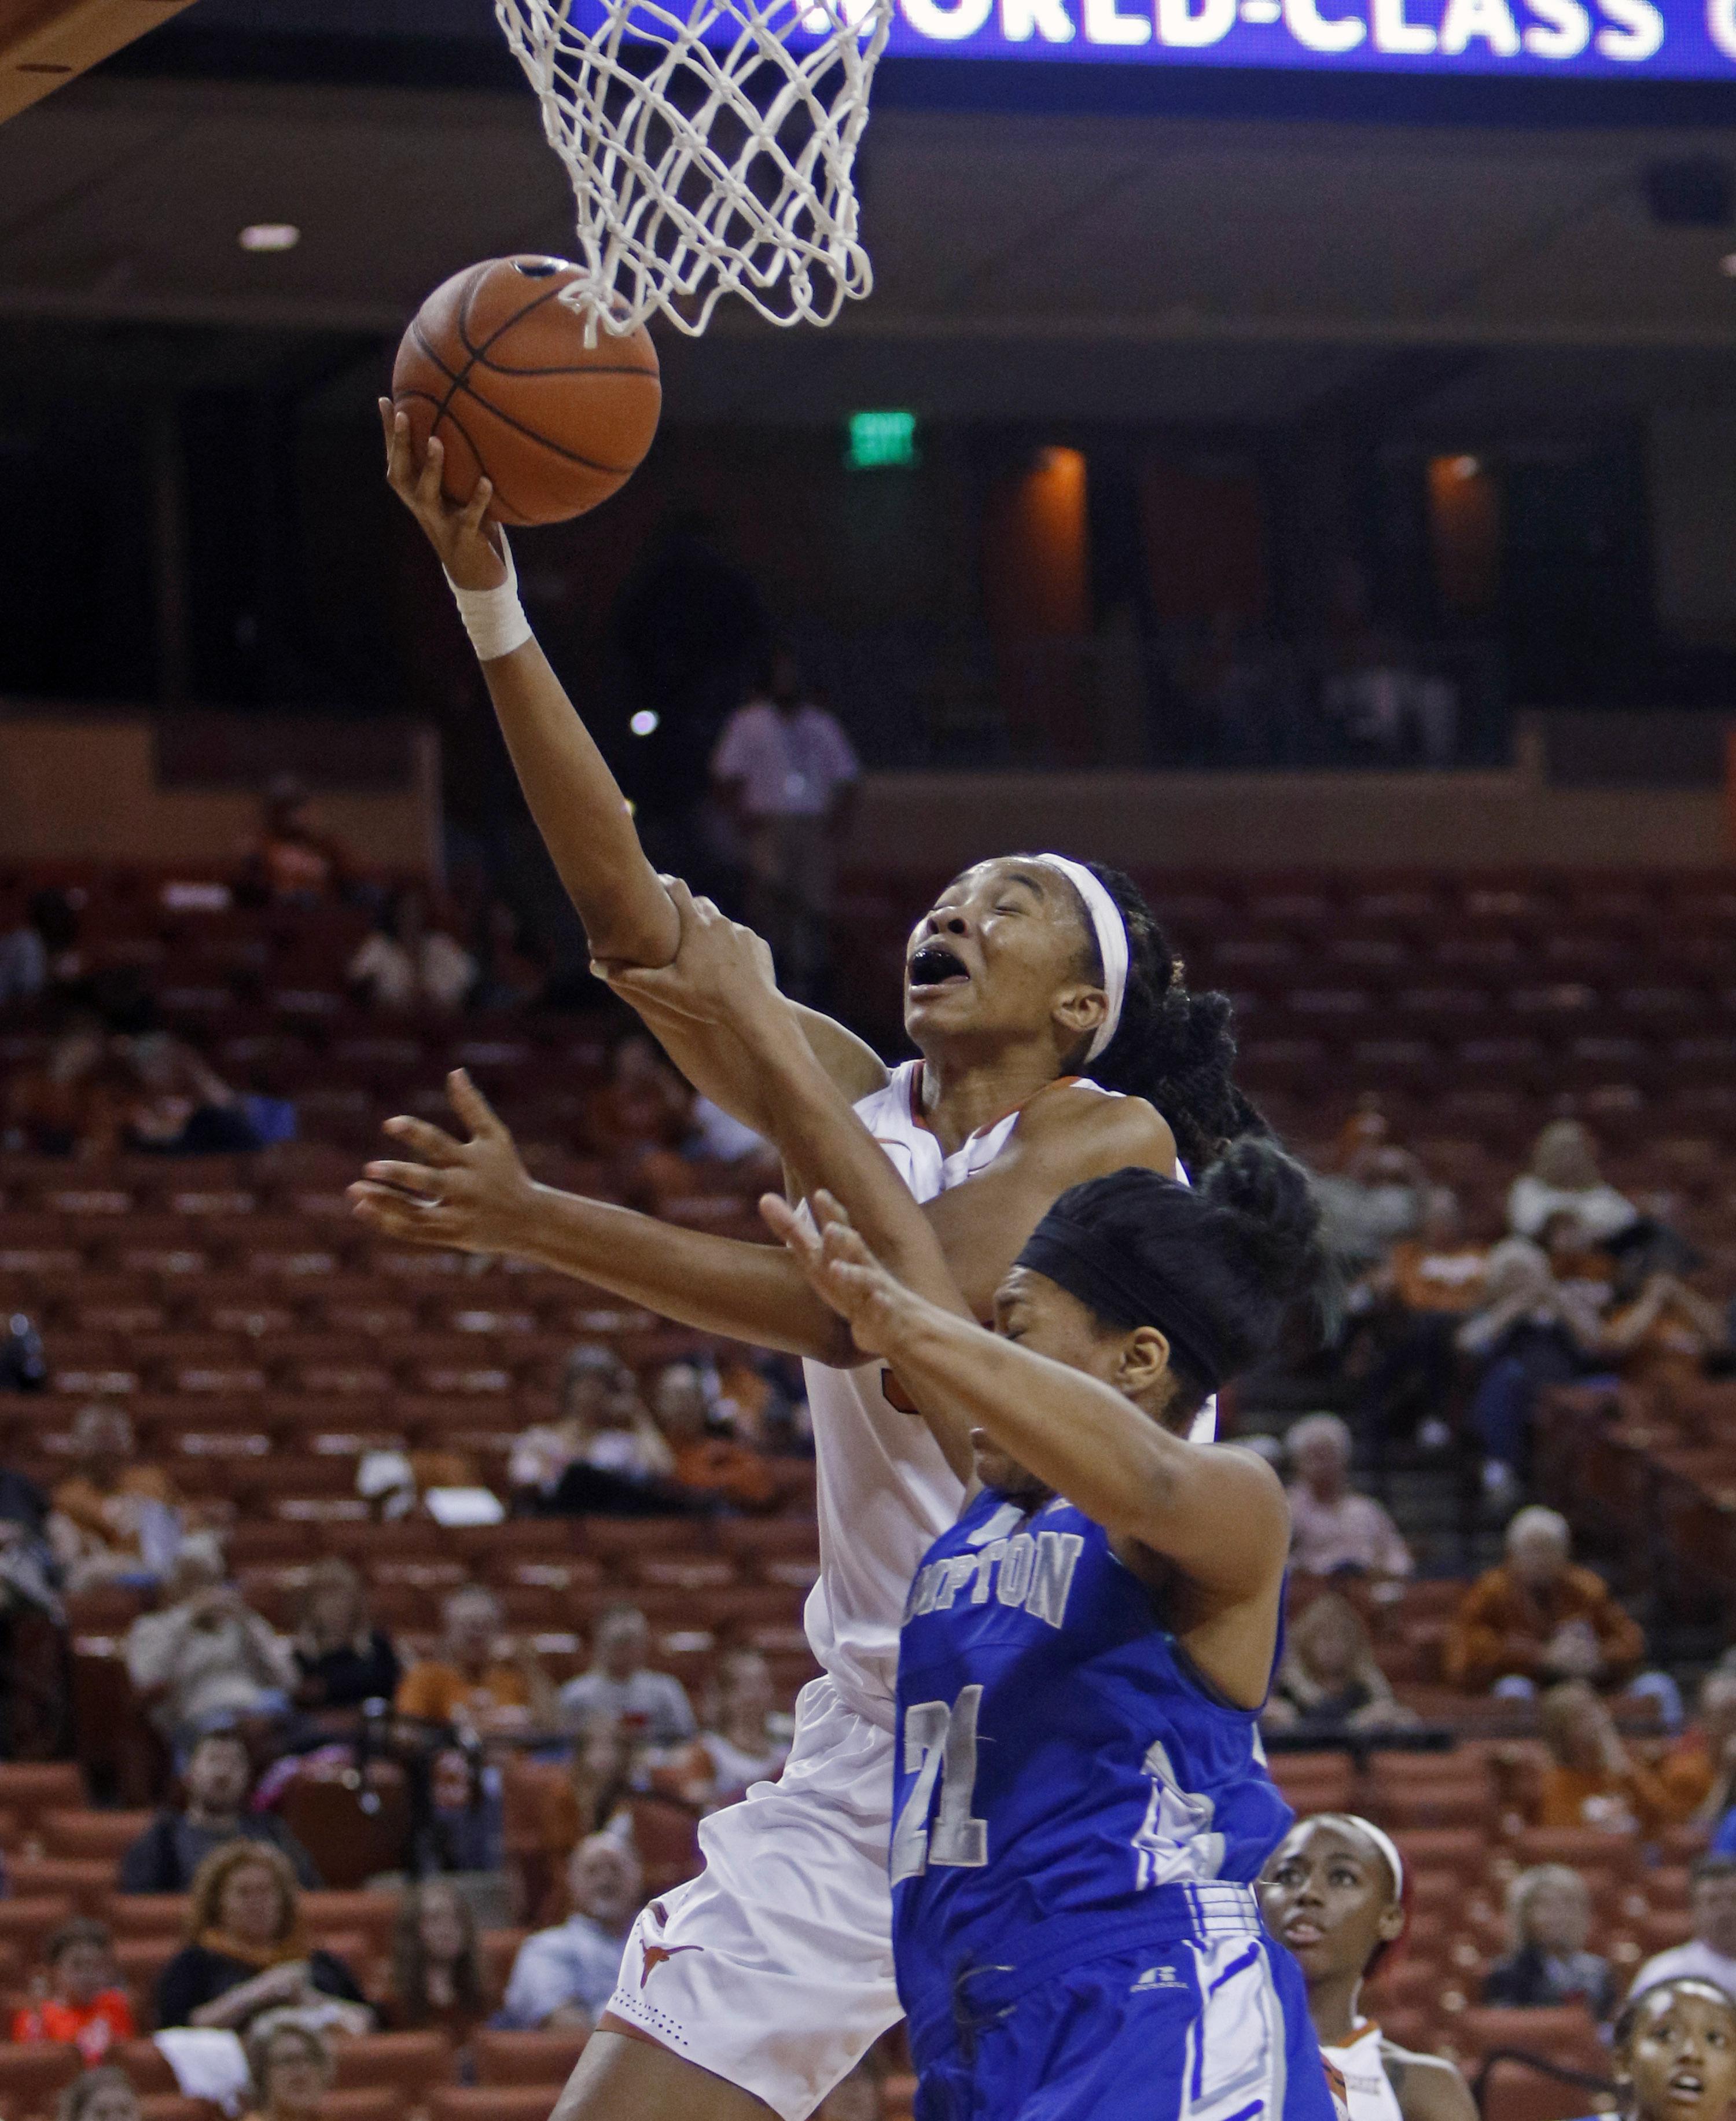 Texas center Imani Boyette shoots against Hampton forward Mikayla Sayle, during the second half of an NCAA college basketball game Wednesday, Nov. 25, 2015, in Austin, Texas. Texas won 79-52. (AP Photo/Michael Thomas)